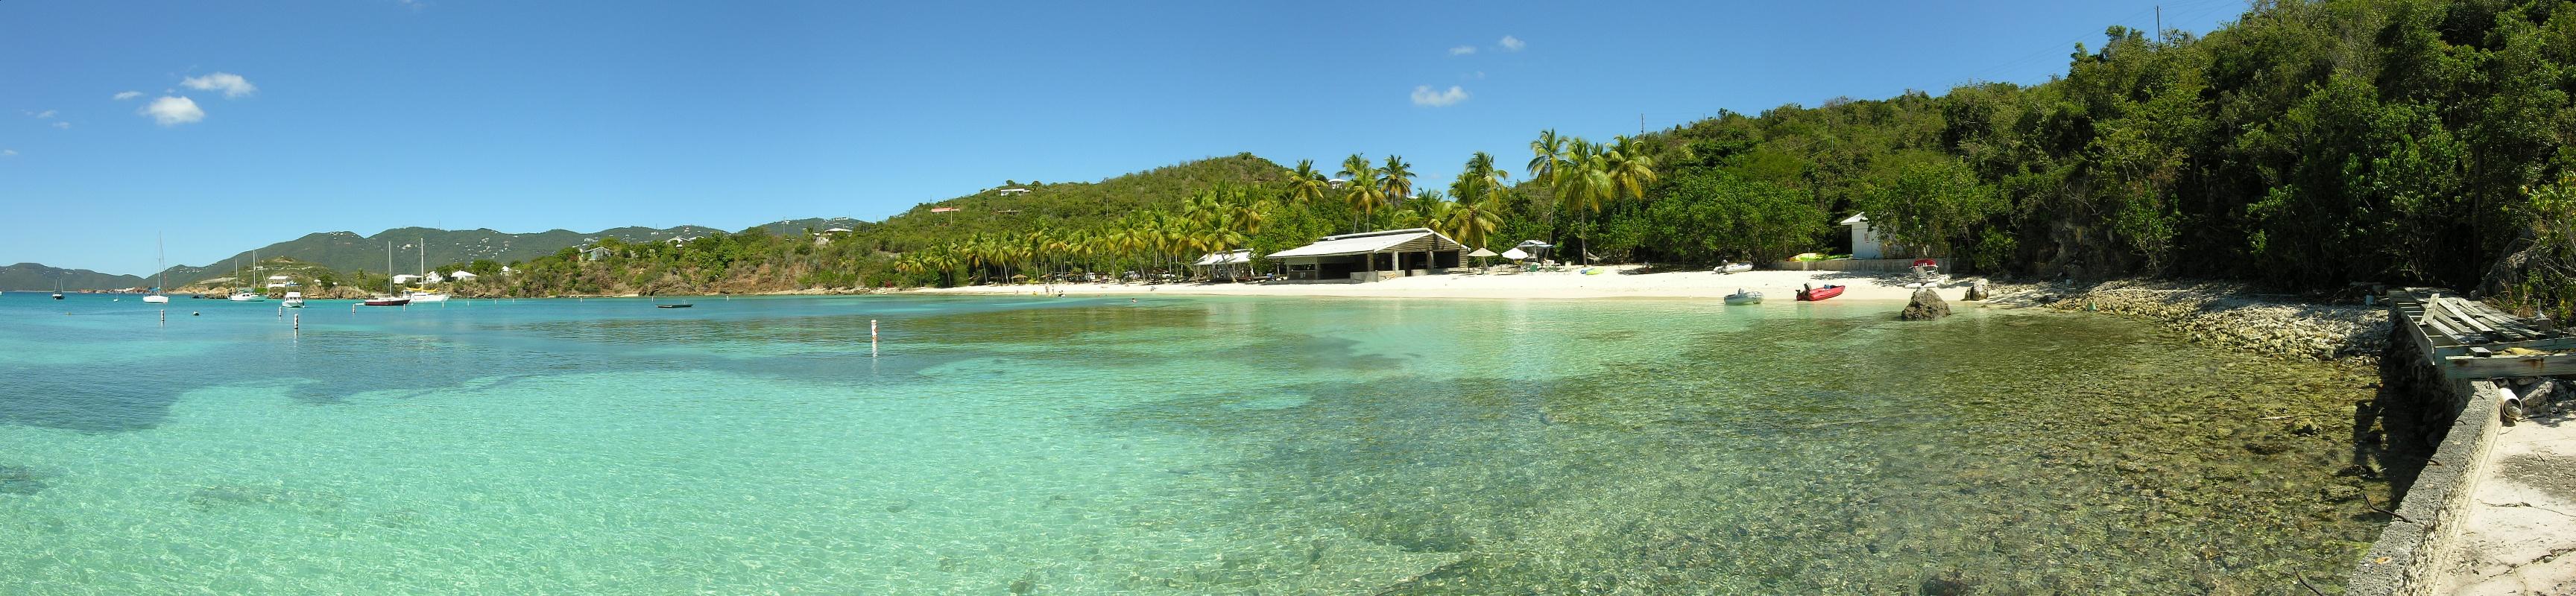 Photo 66 of 90 album virgin islands panoramas for St thomas honeymoon beach